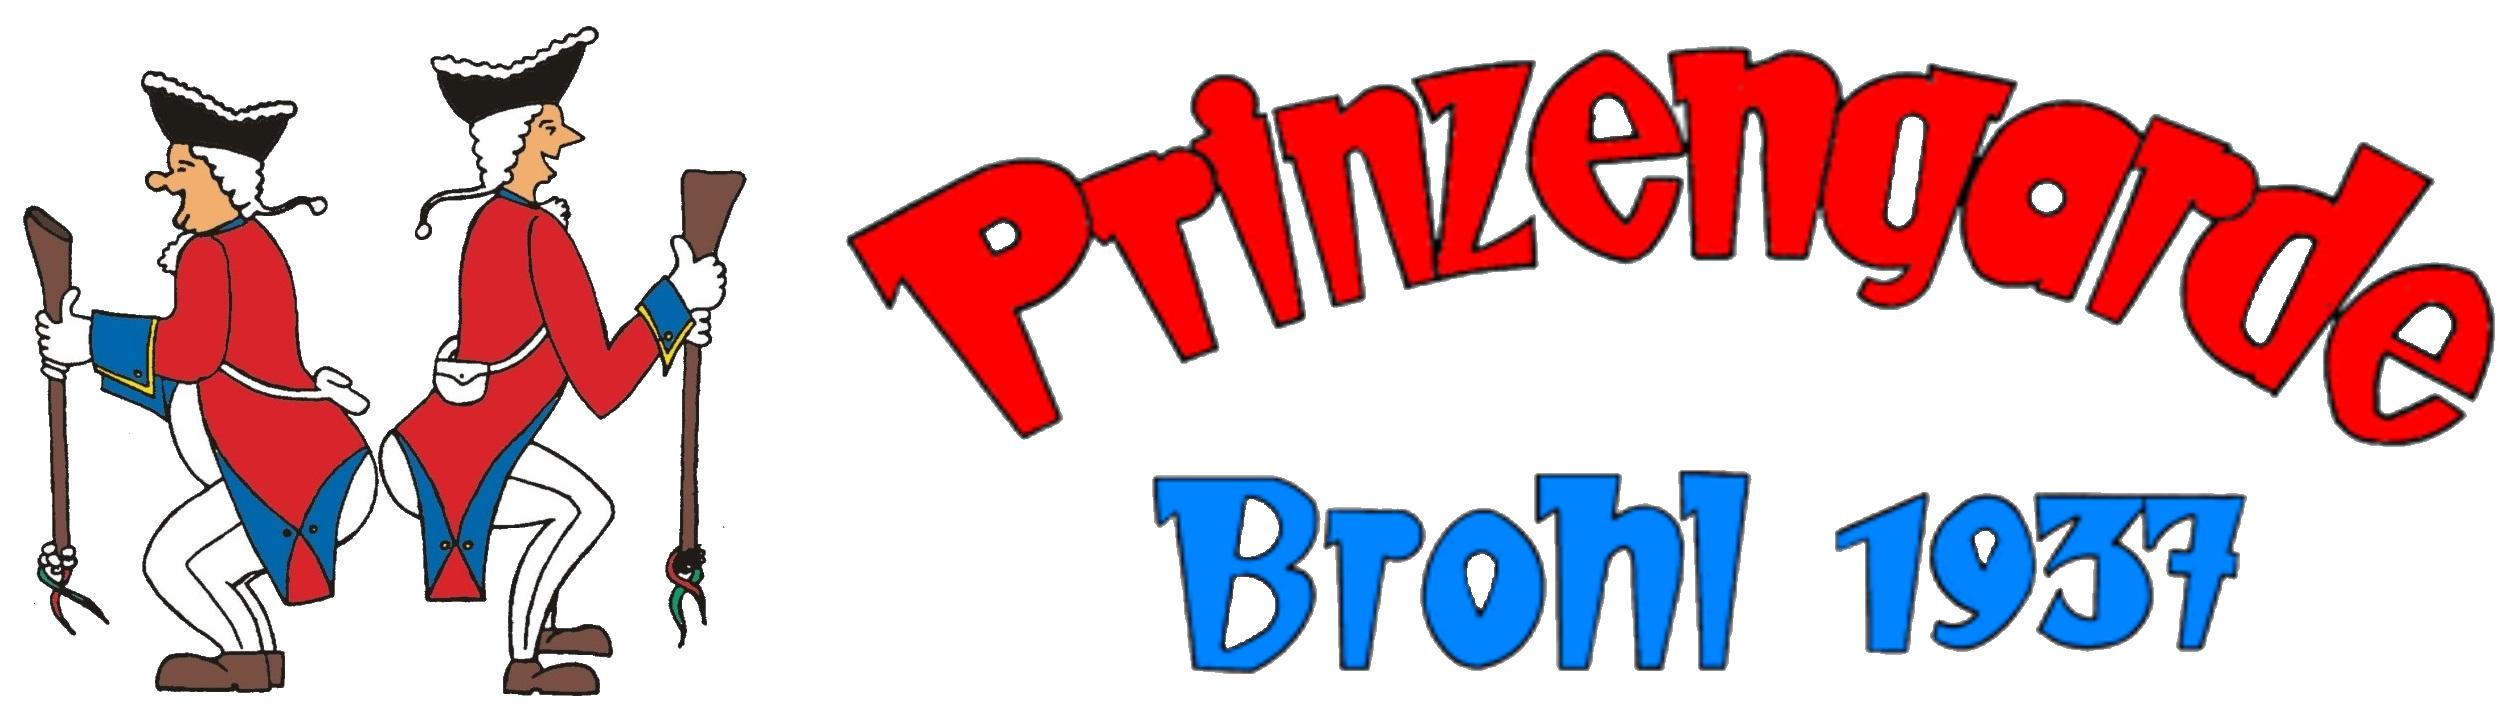 Prinzengarde Brohl 1937 e.V.